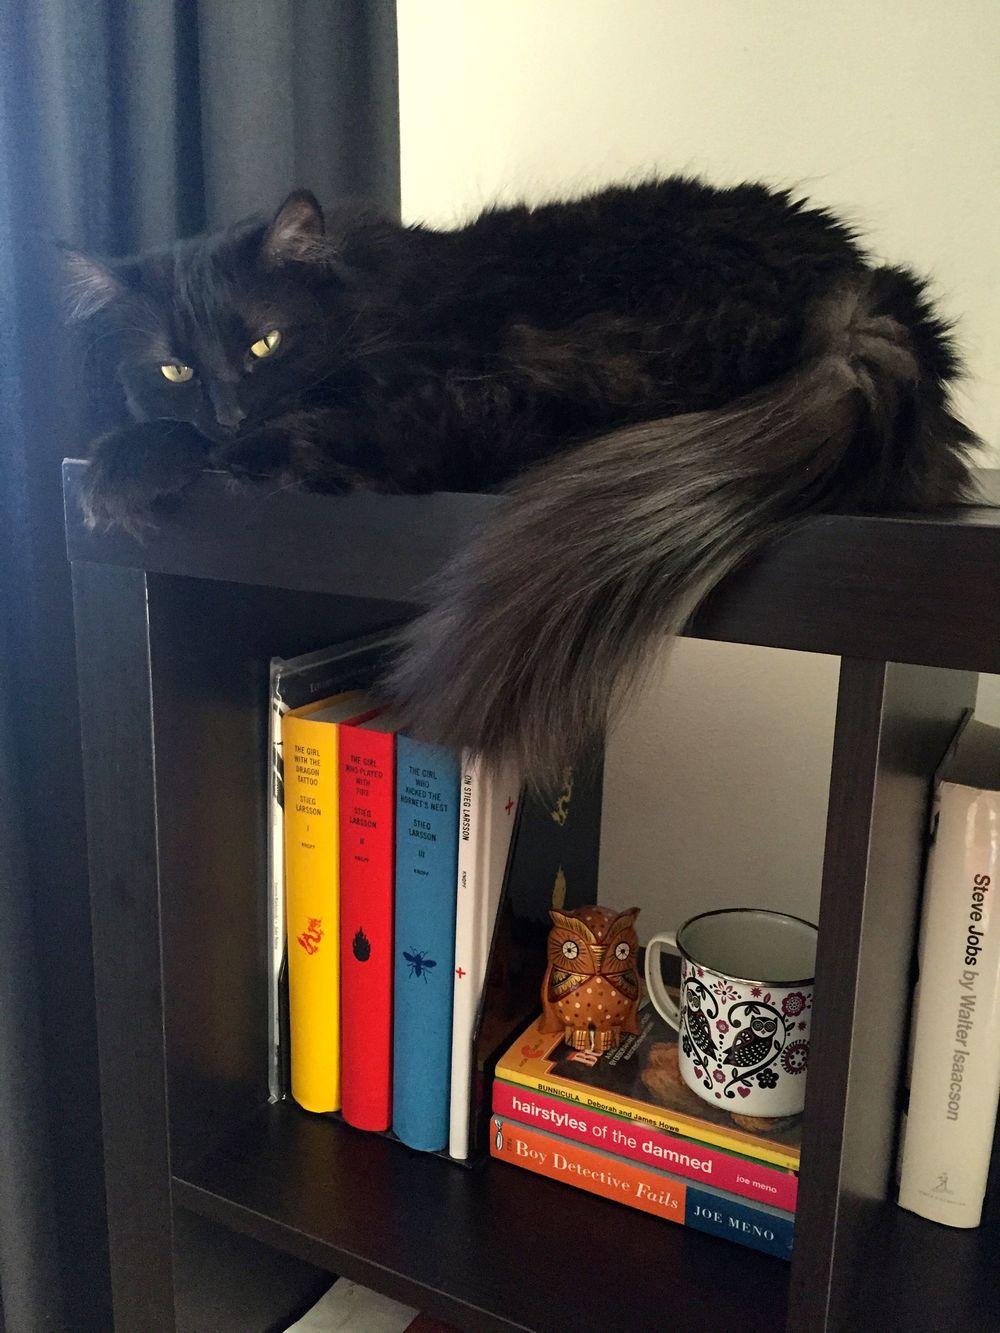 ZZ Cat dares curiosity to try.